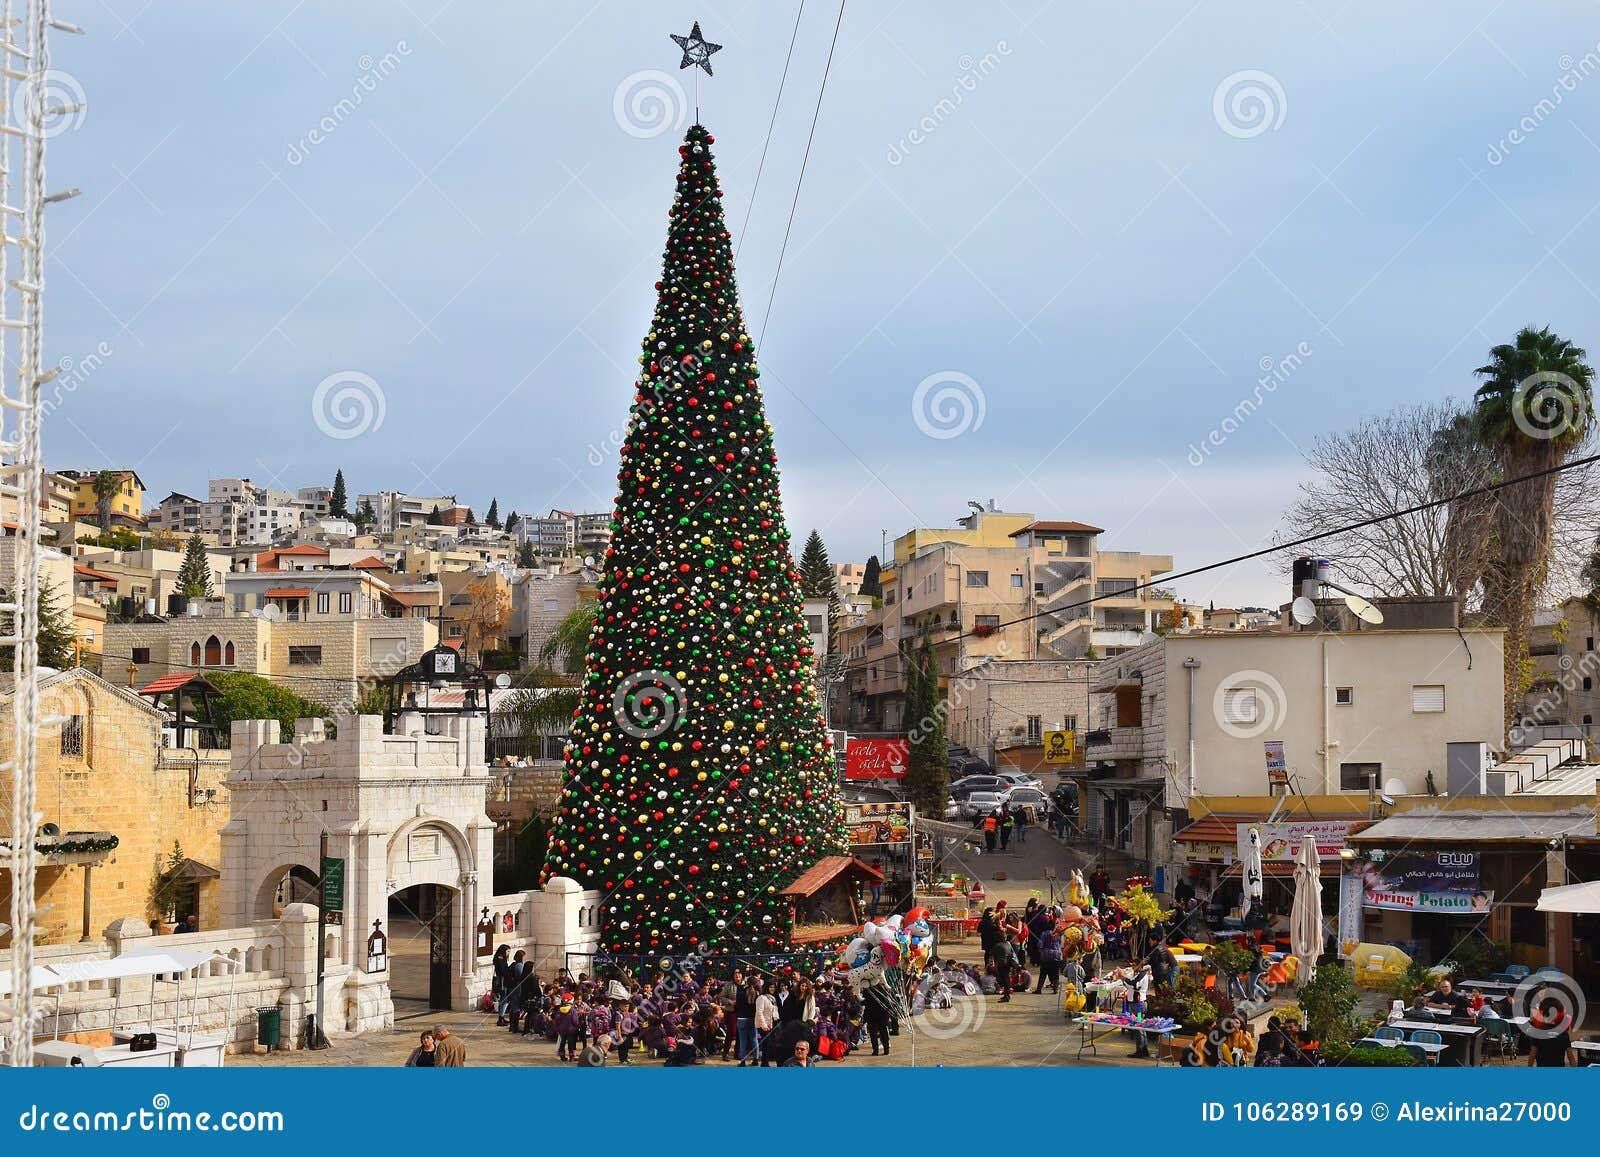 christmas celebration in nazareth israel - When Is Greek Orthodox Christmas